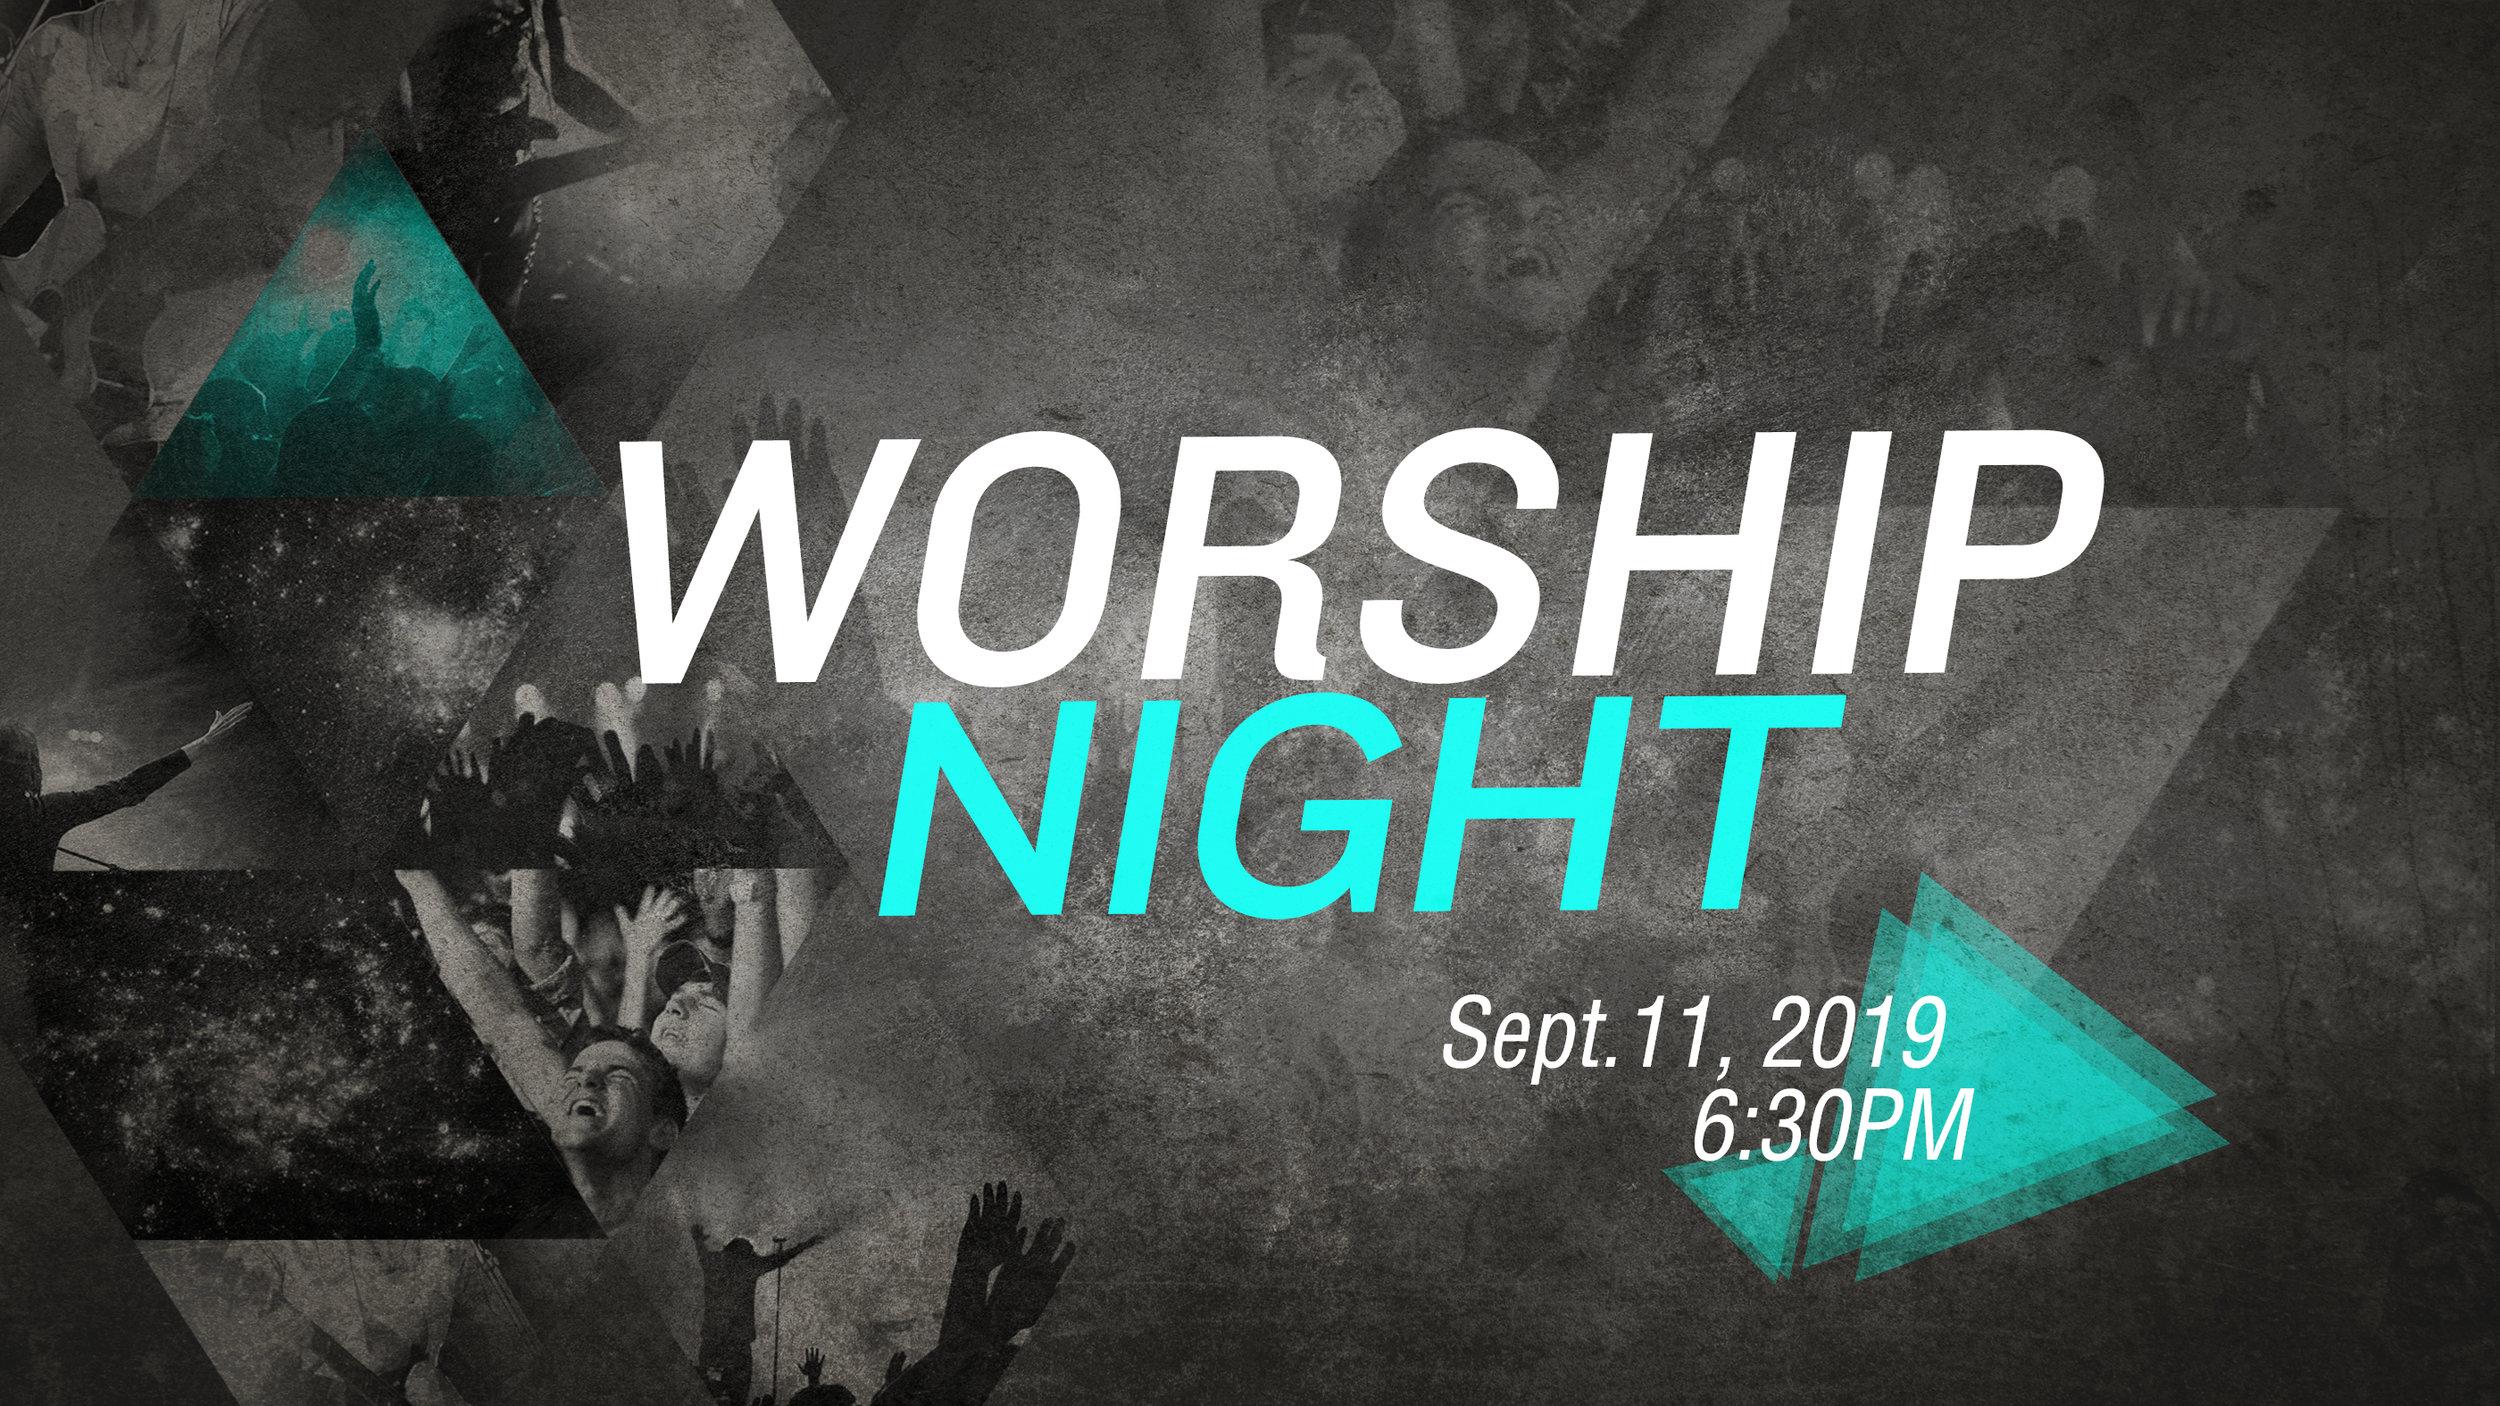 worship night 9.11.19.jpg